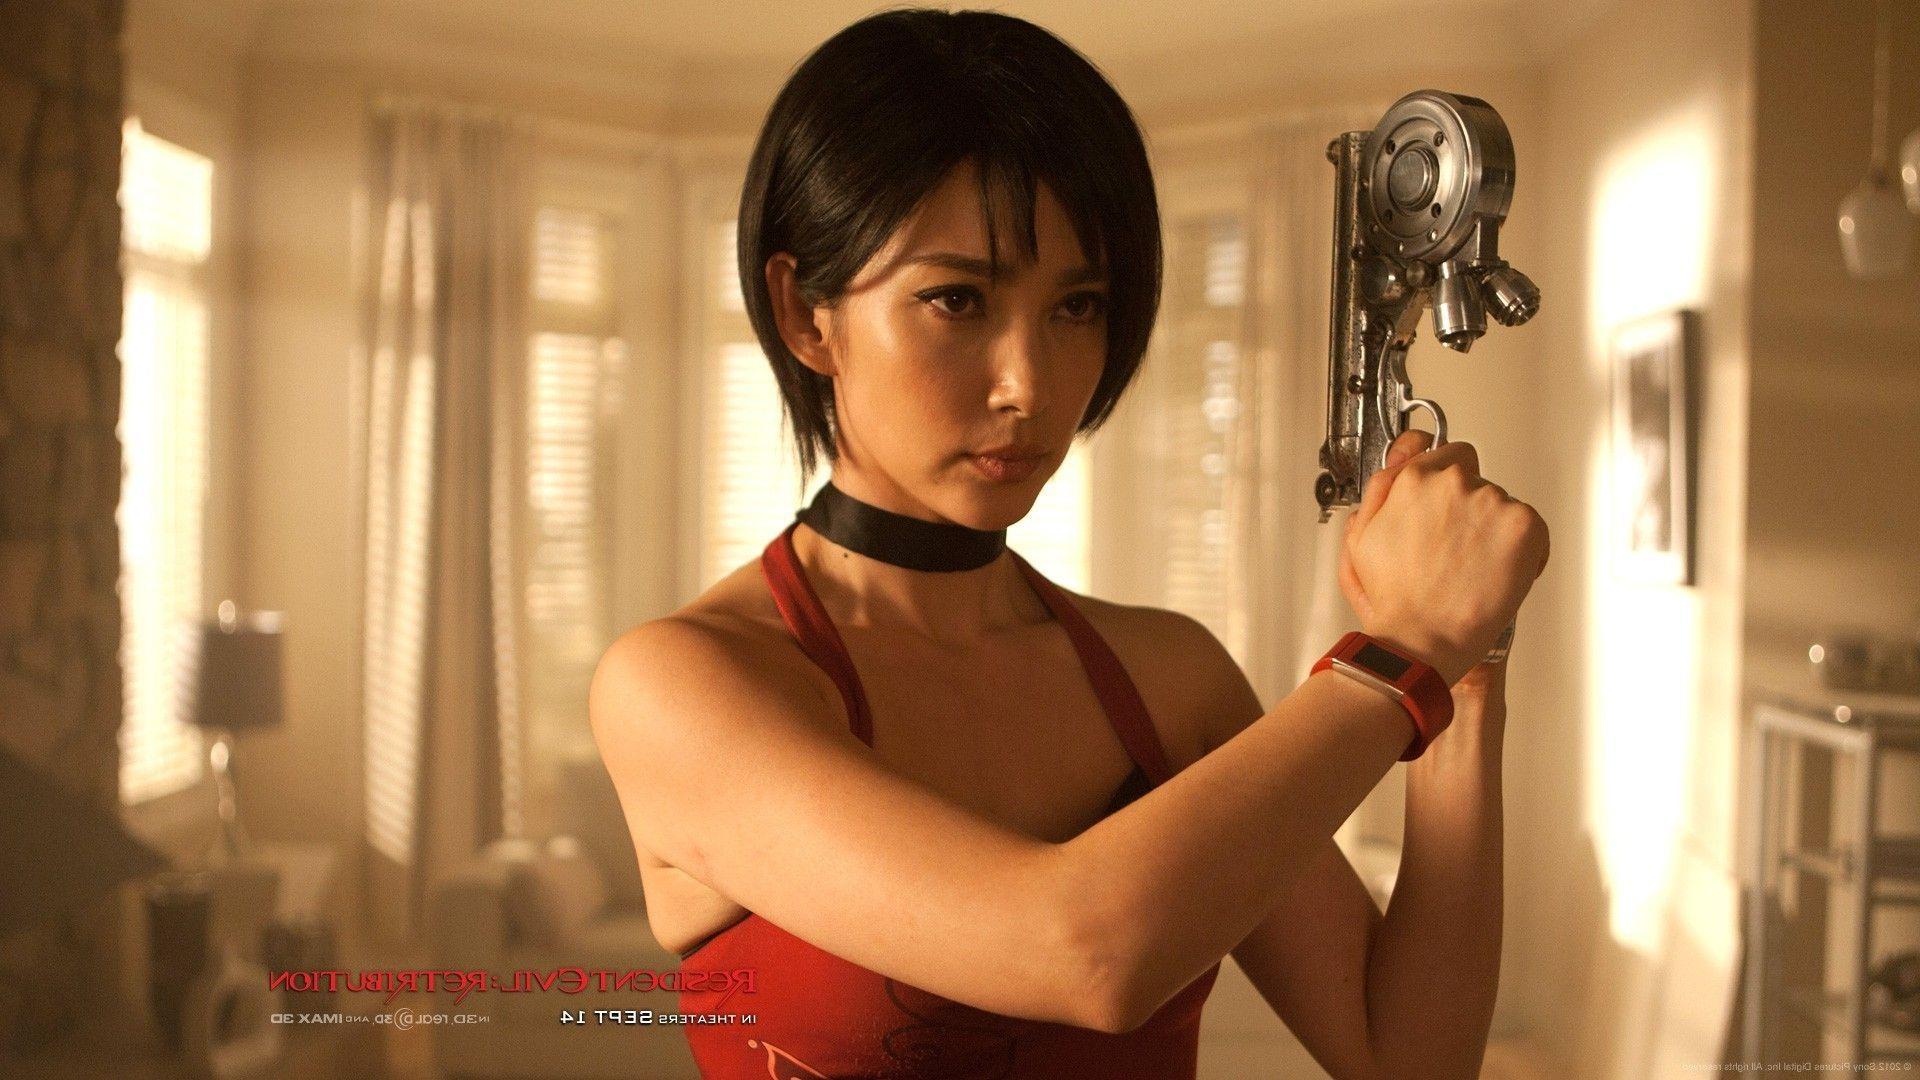 Resident Evil Retribution Li Bingbing Ada Wong Bikini Cloudpix